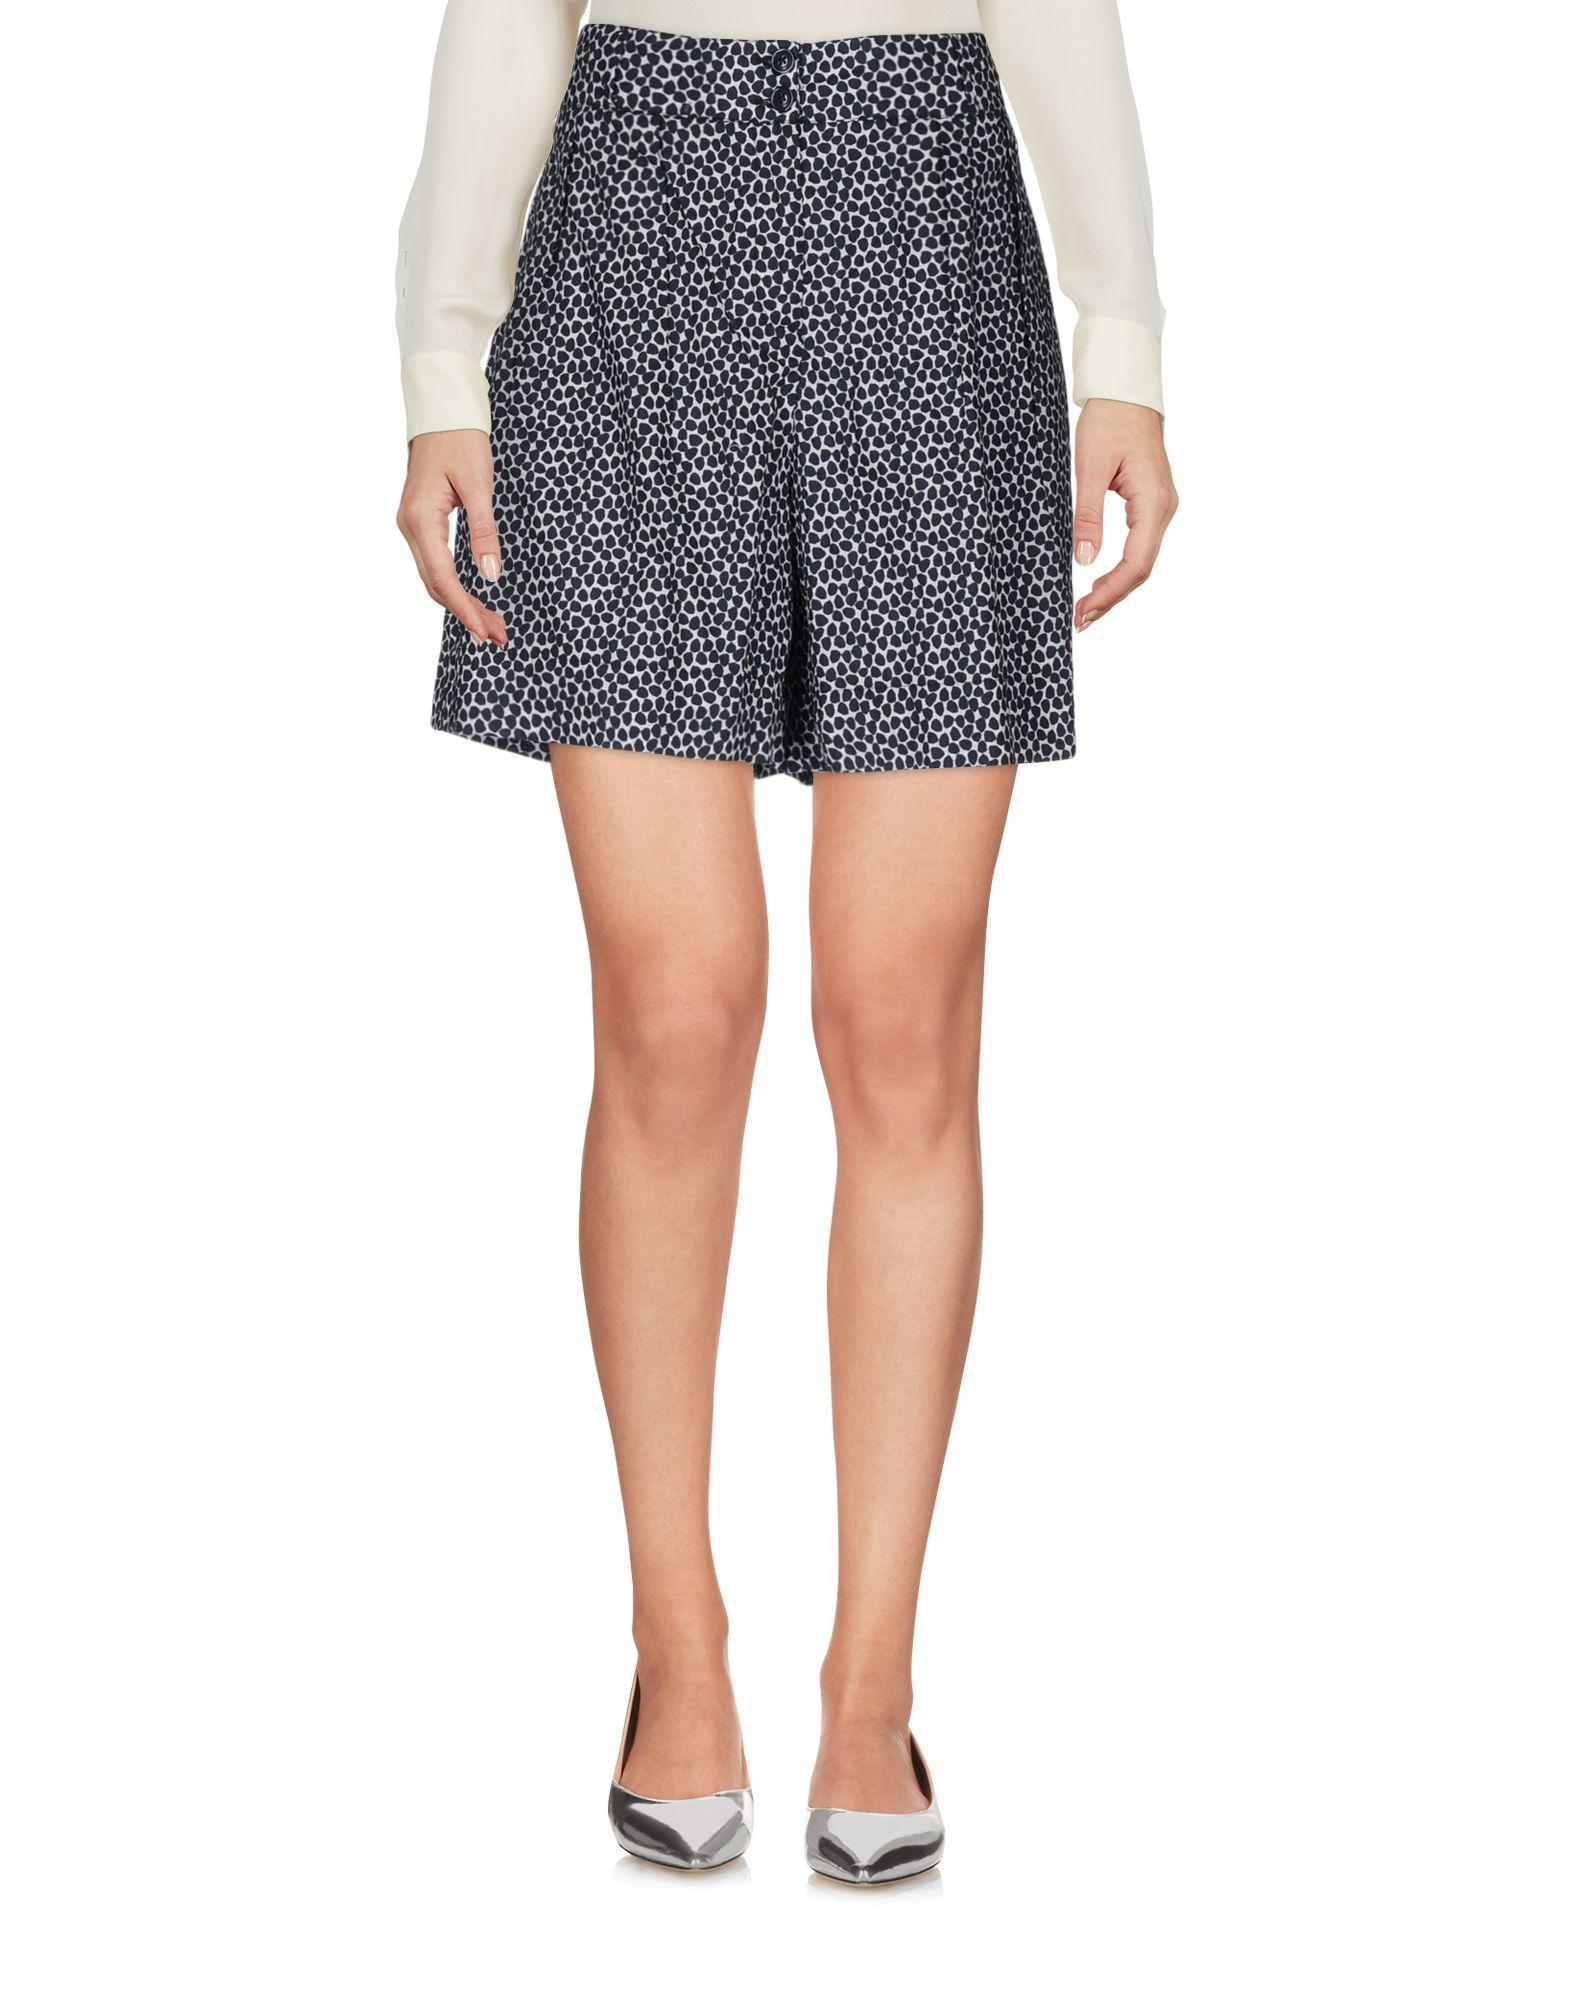 Woolrich Dark Blue Print Cotton Skirt